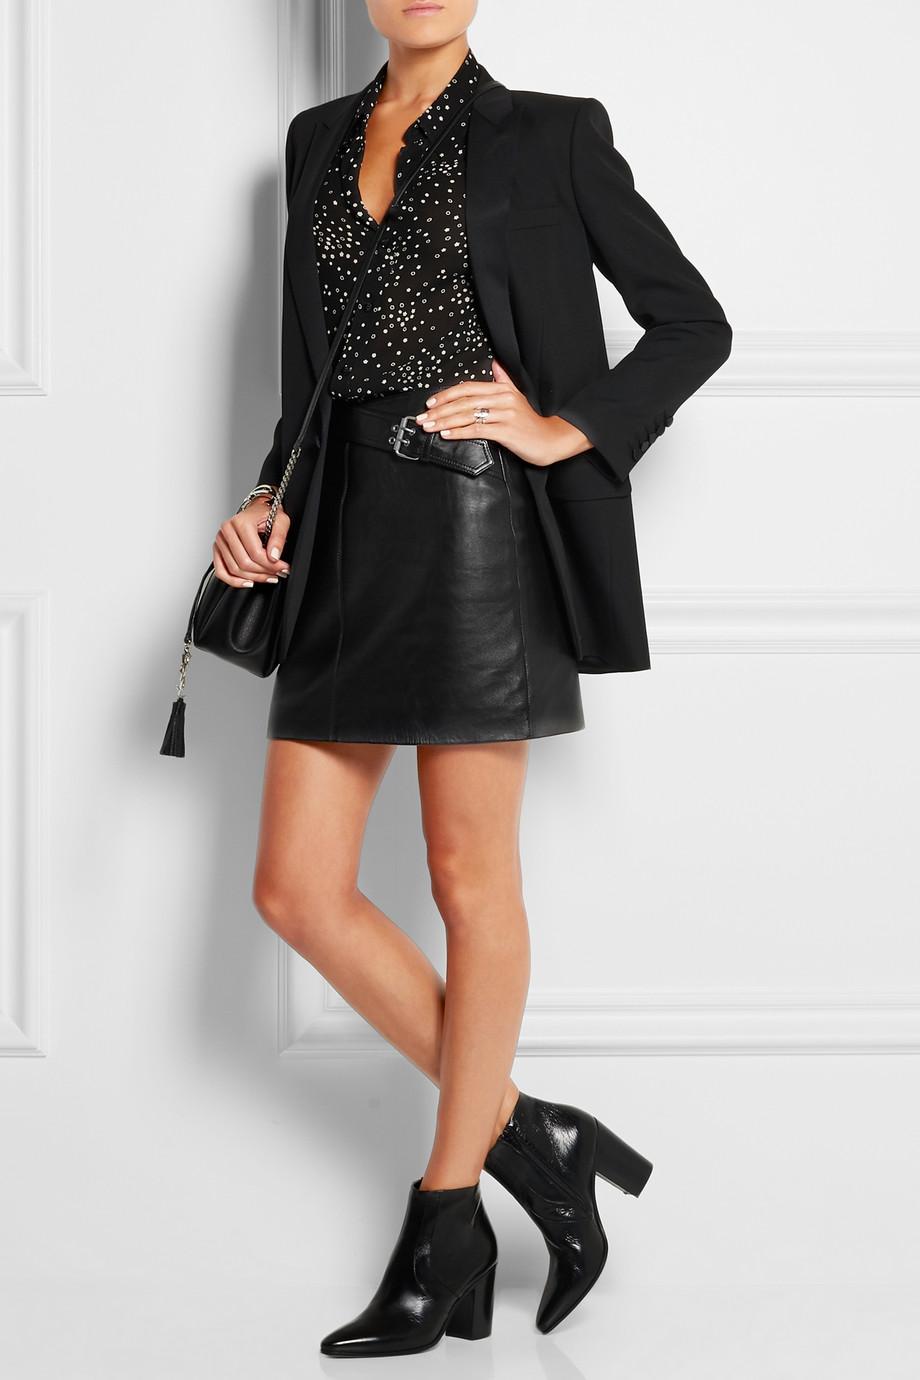 a boyfriend blazer and mini skirt